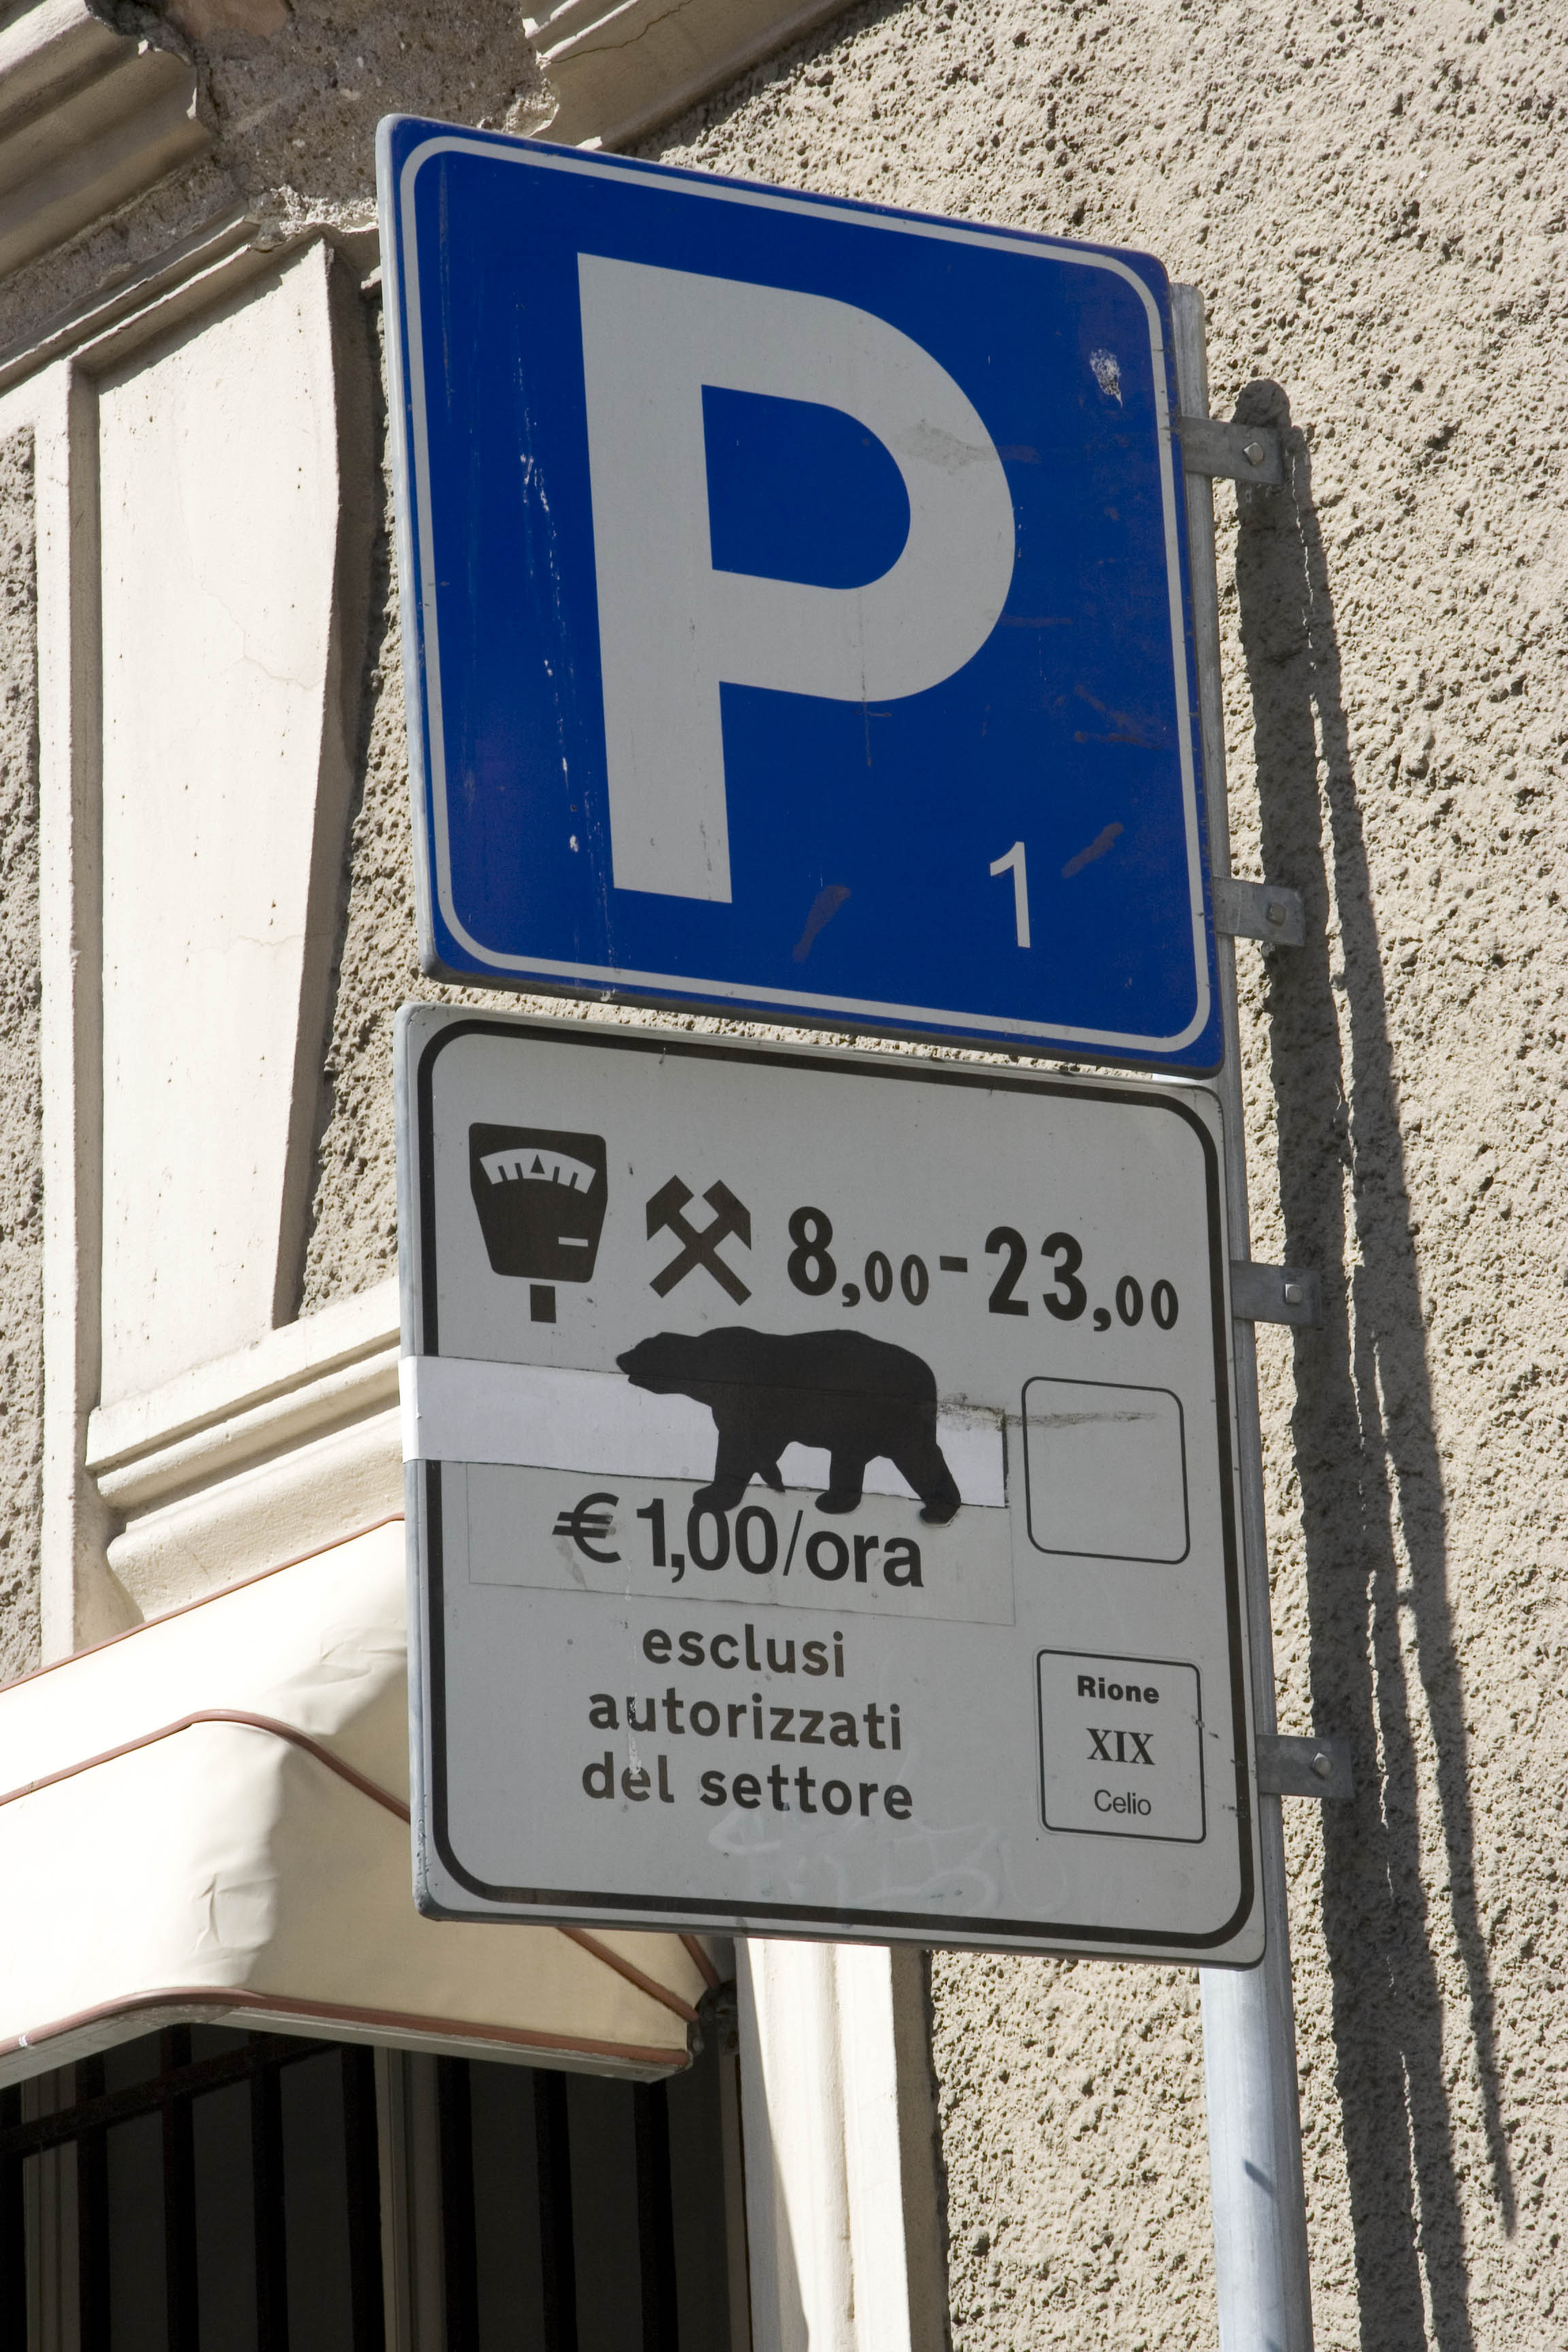 Спец.условия для парковки медведей